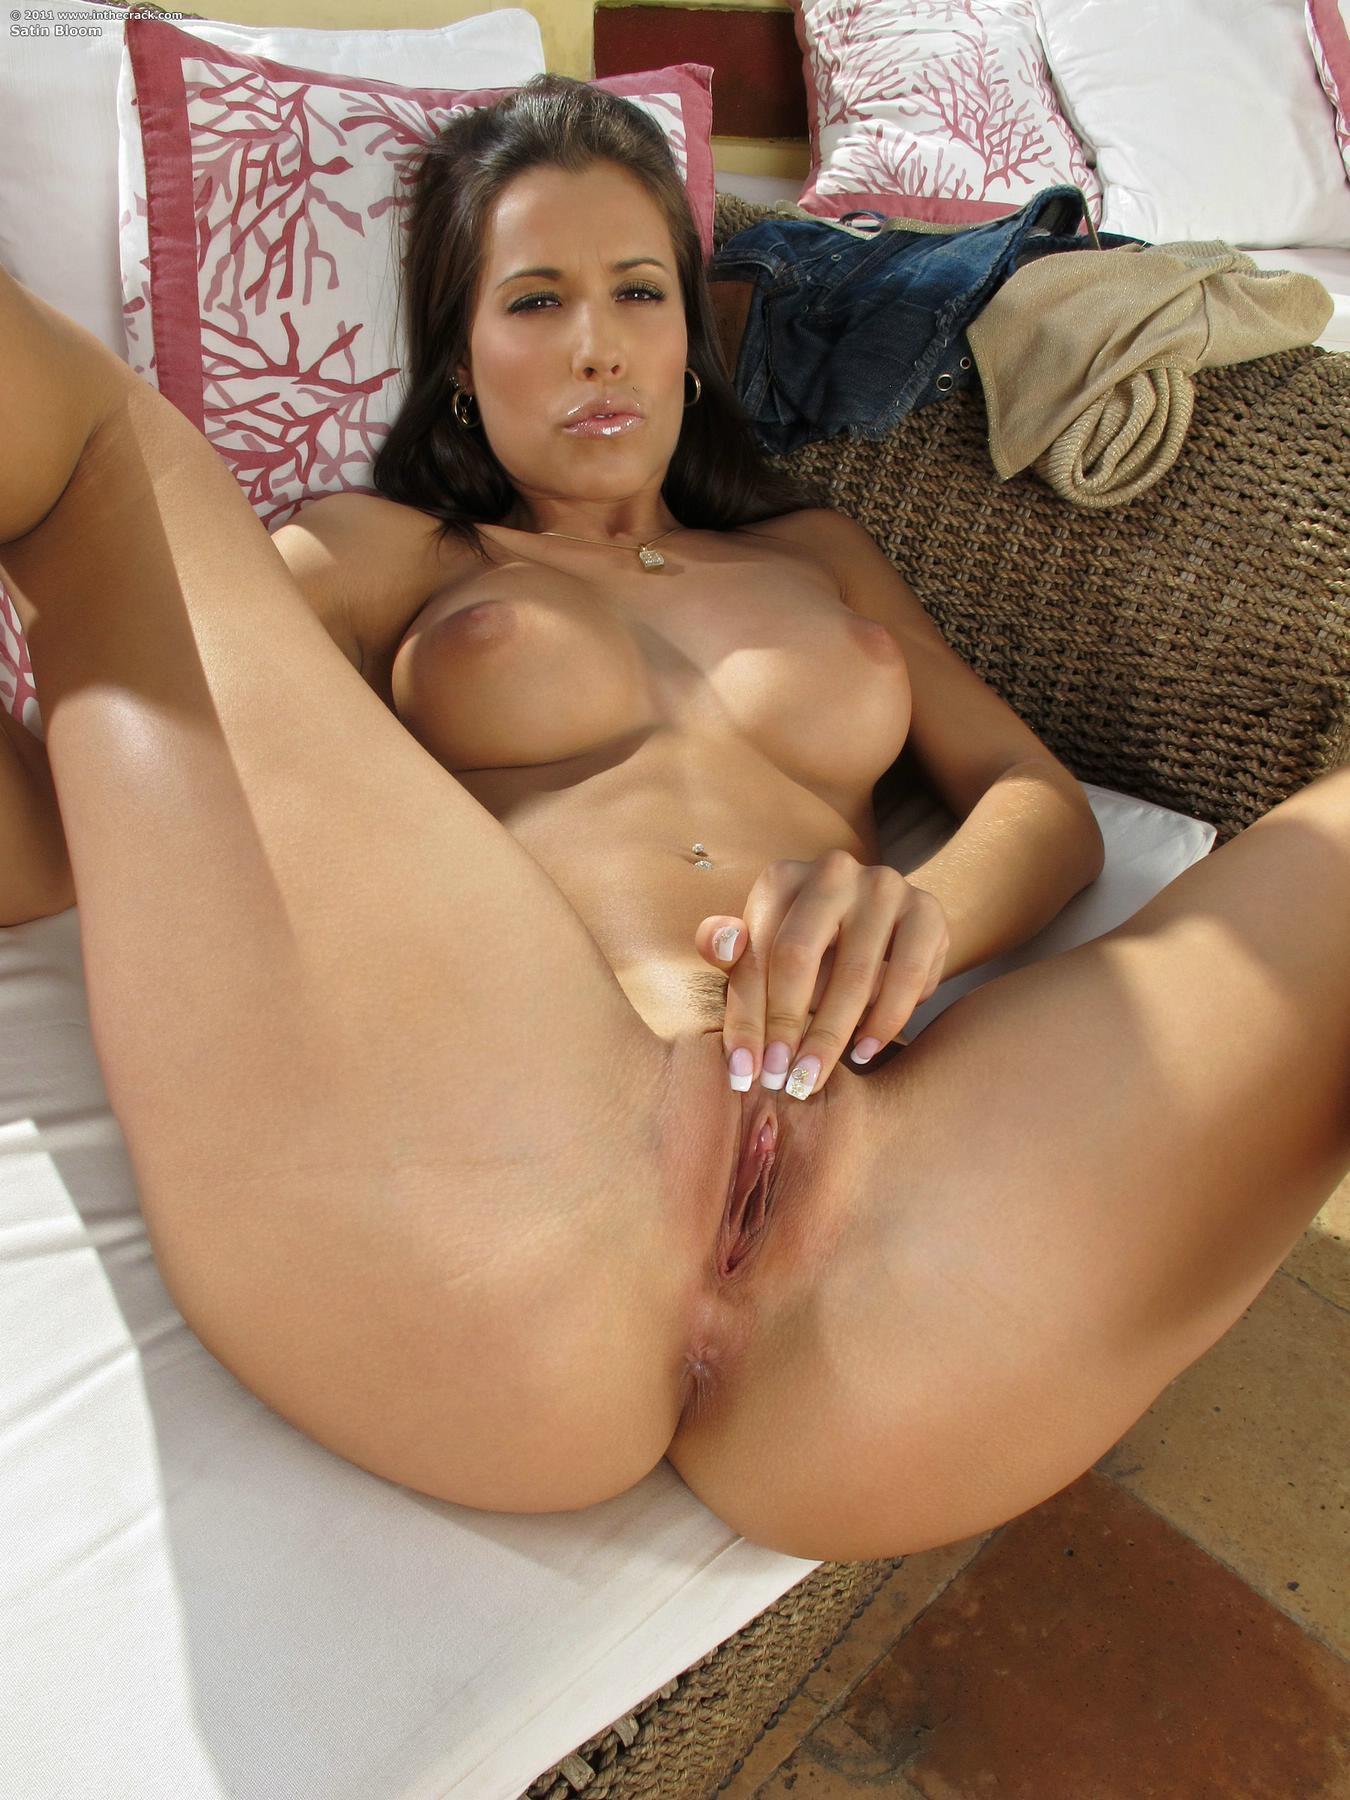 Italian nudes